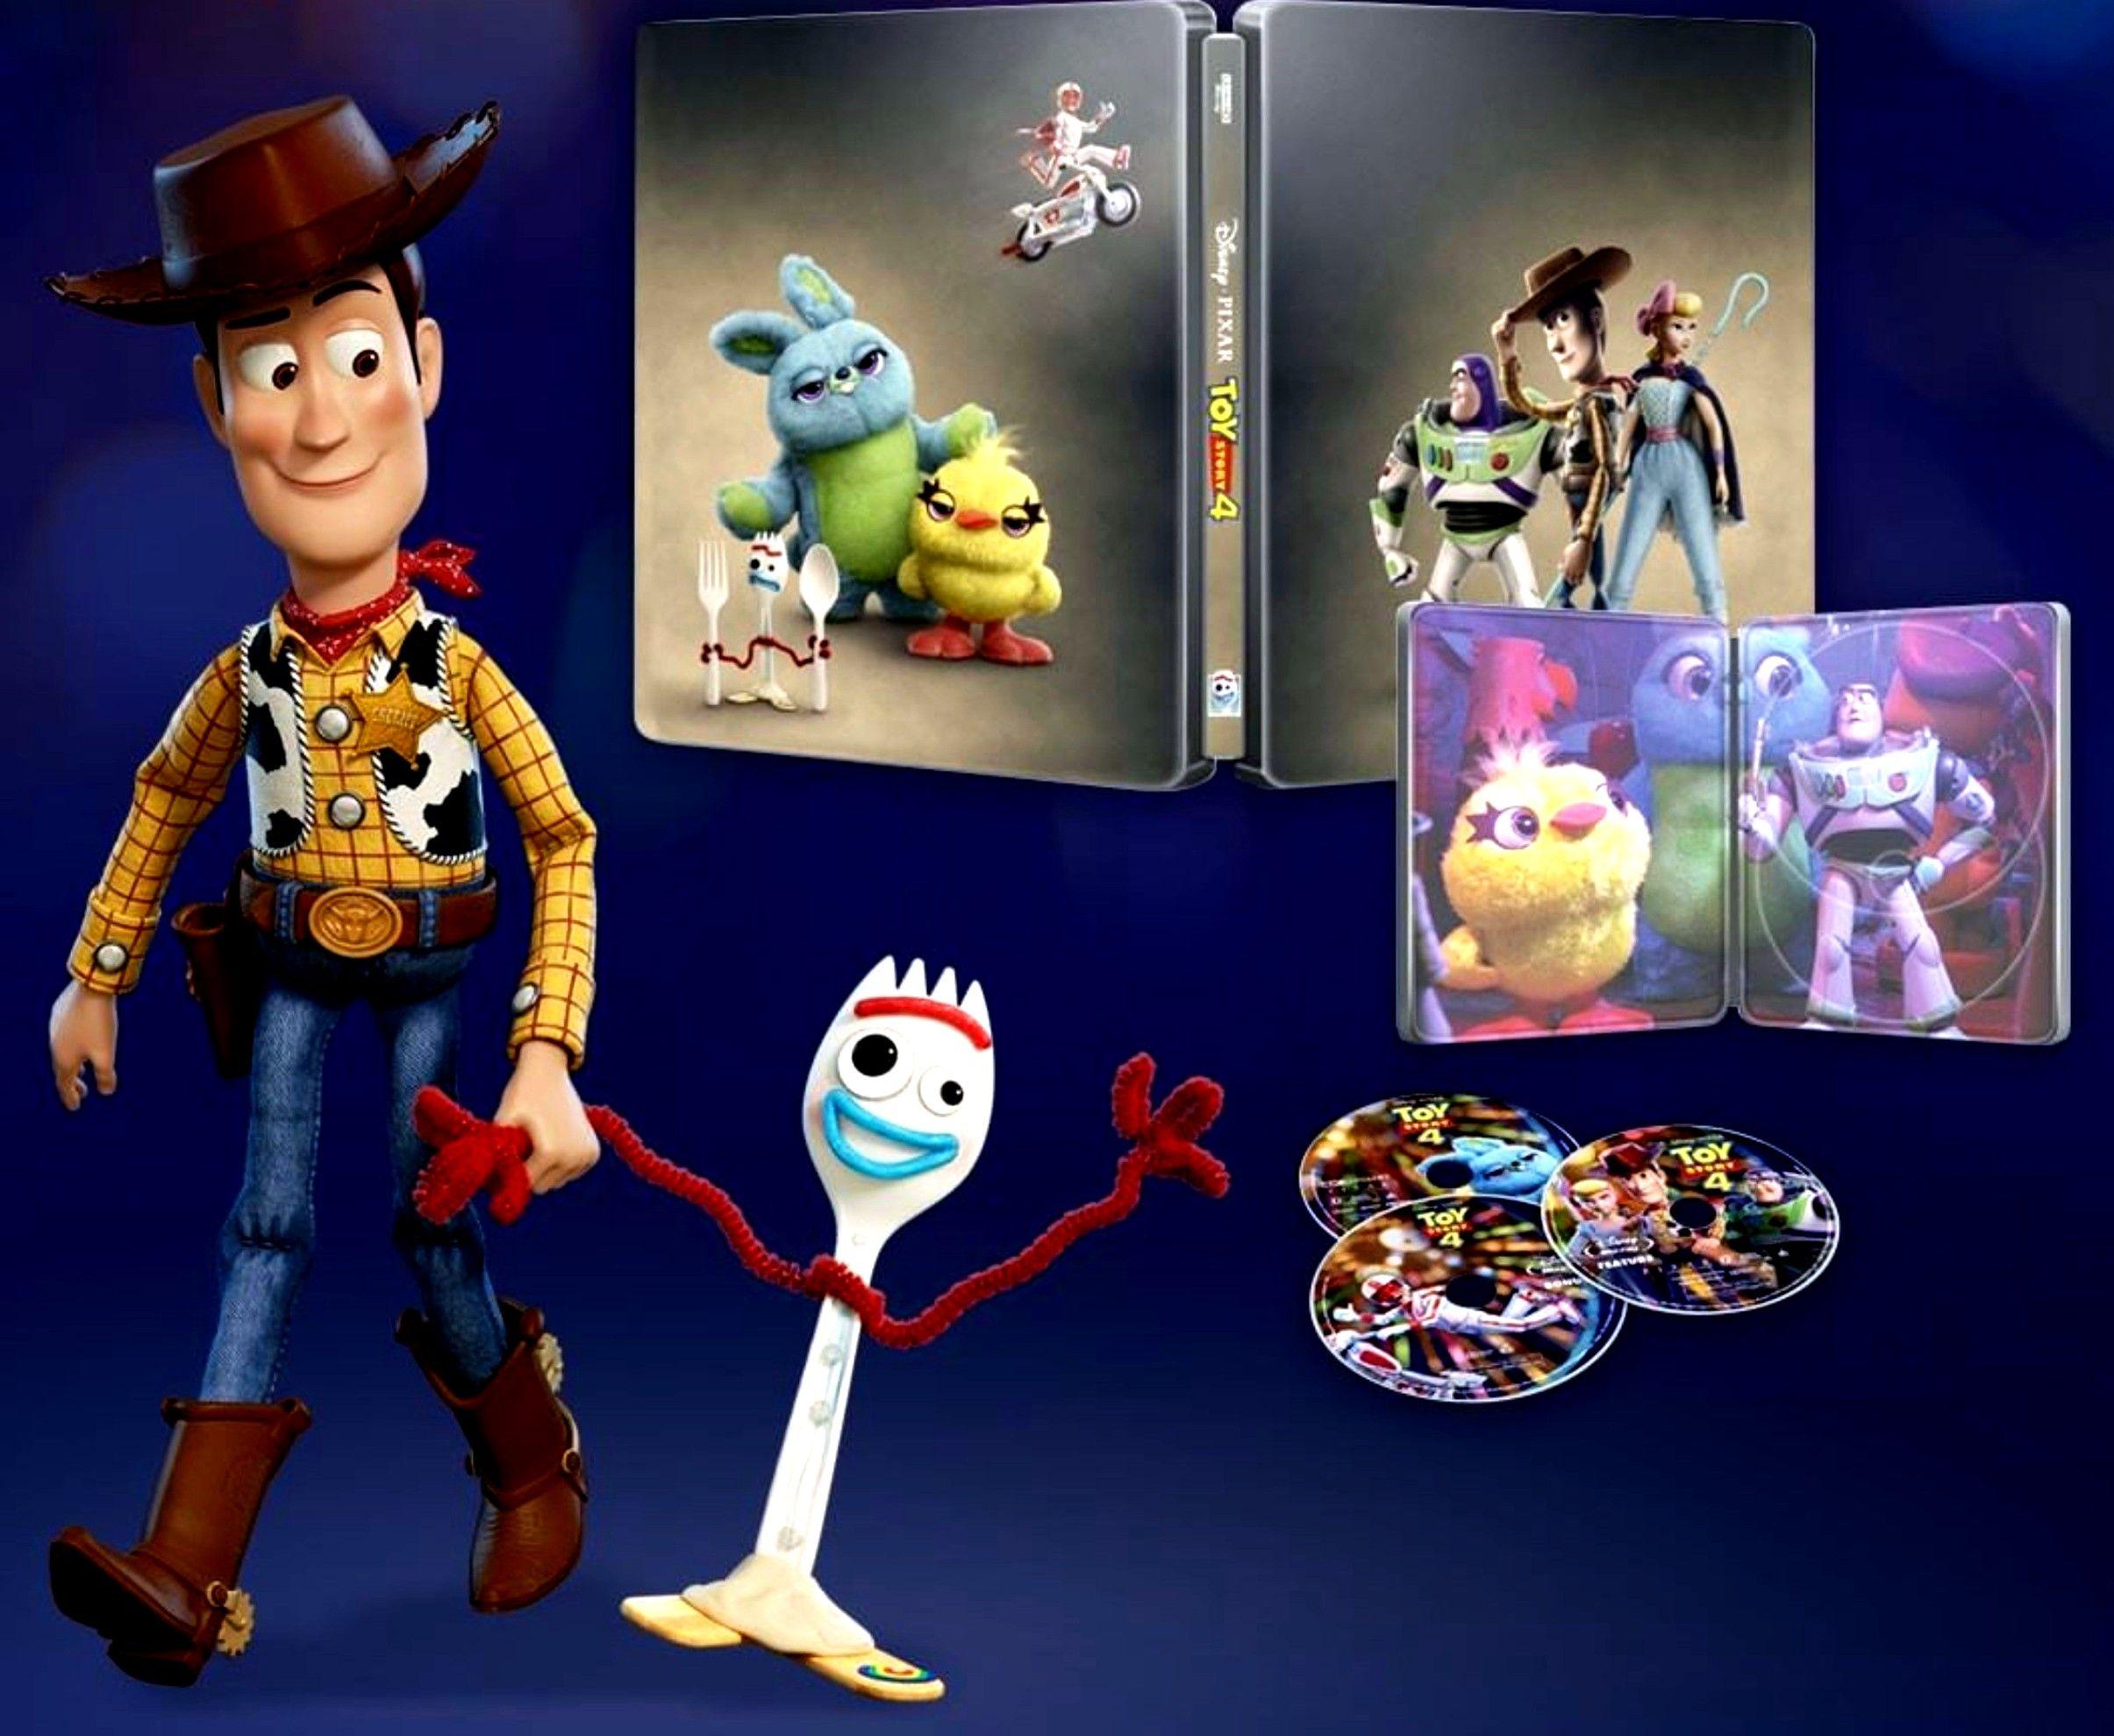 Toy Story 4 Digital Dvd Sheriff Woody Pride Toy Story Woody Pride